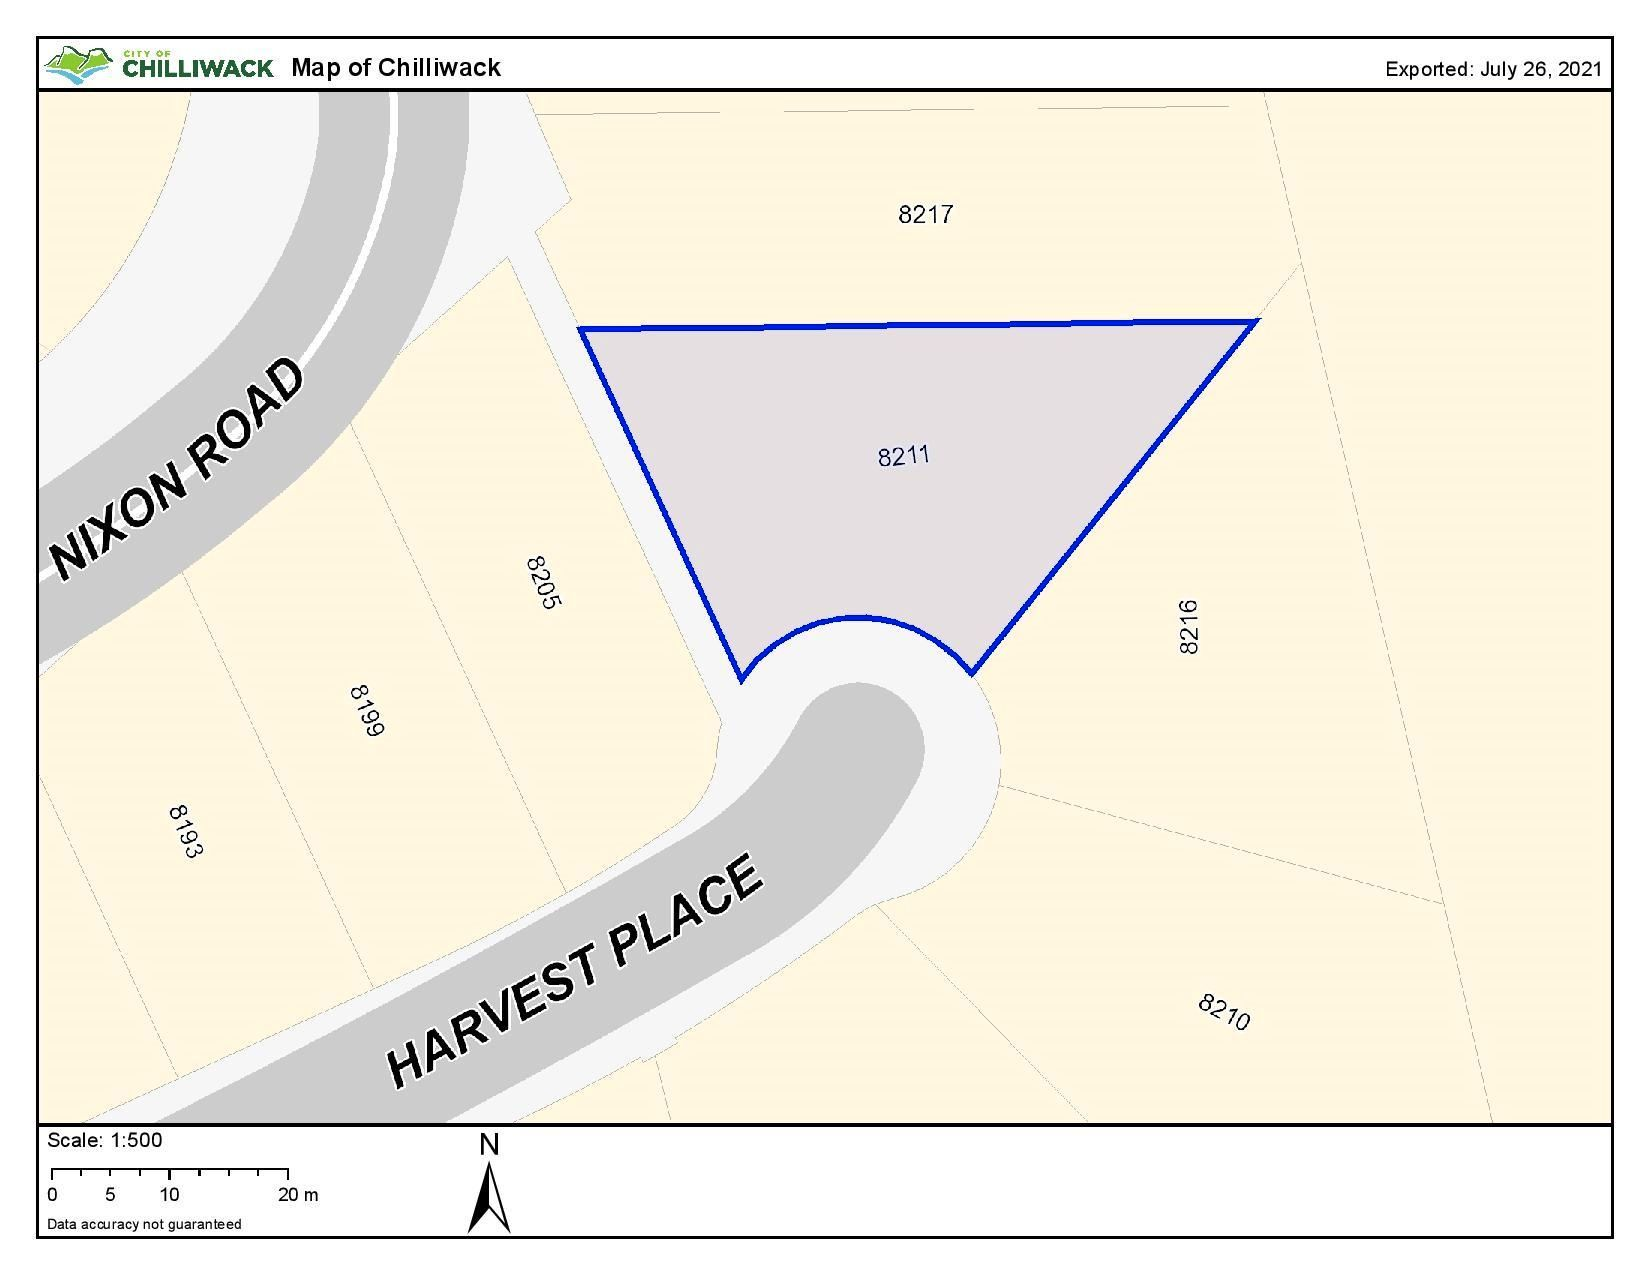 Main Photo: 8211 HARVEST Place in Chilliwack: Eastern Hillsides Land for sale : MLS®# R2605115